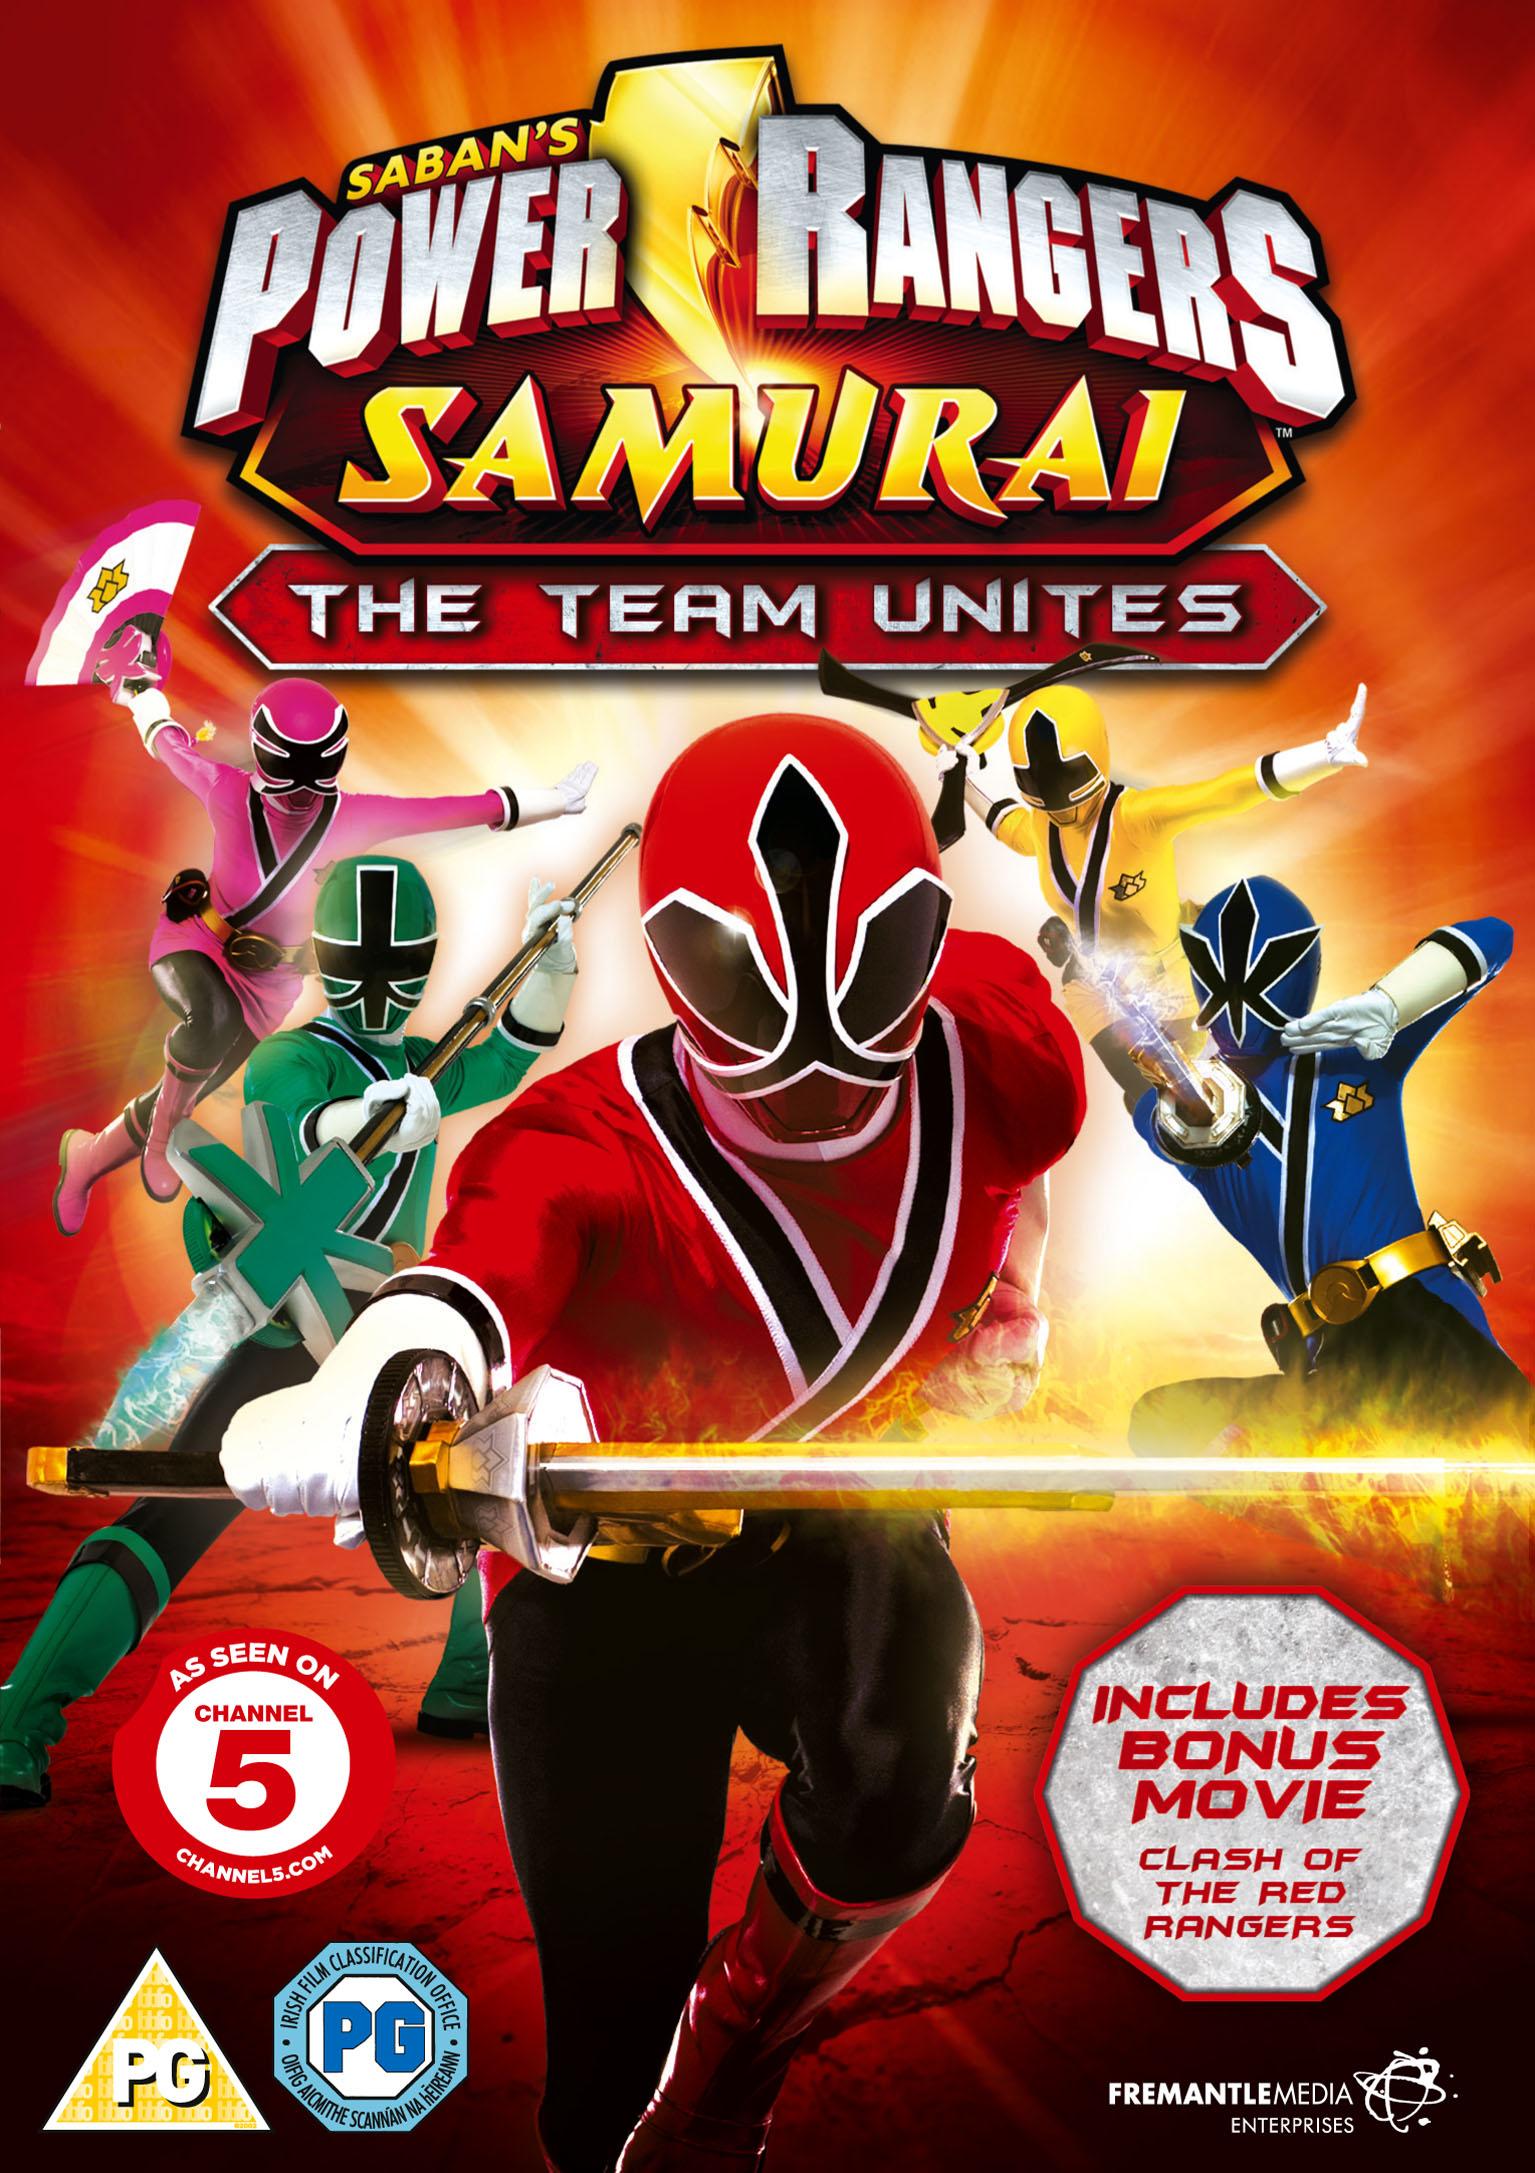 Power rangers samurai the team unites fetch publicity - Power ranger samurai rose ...